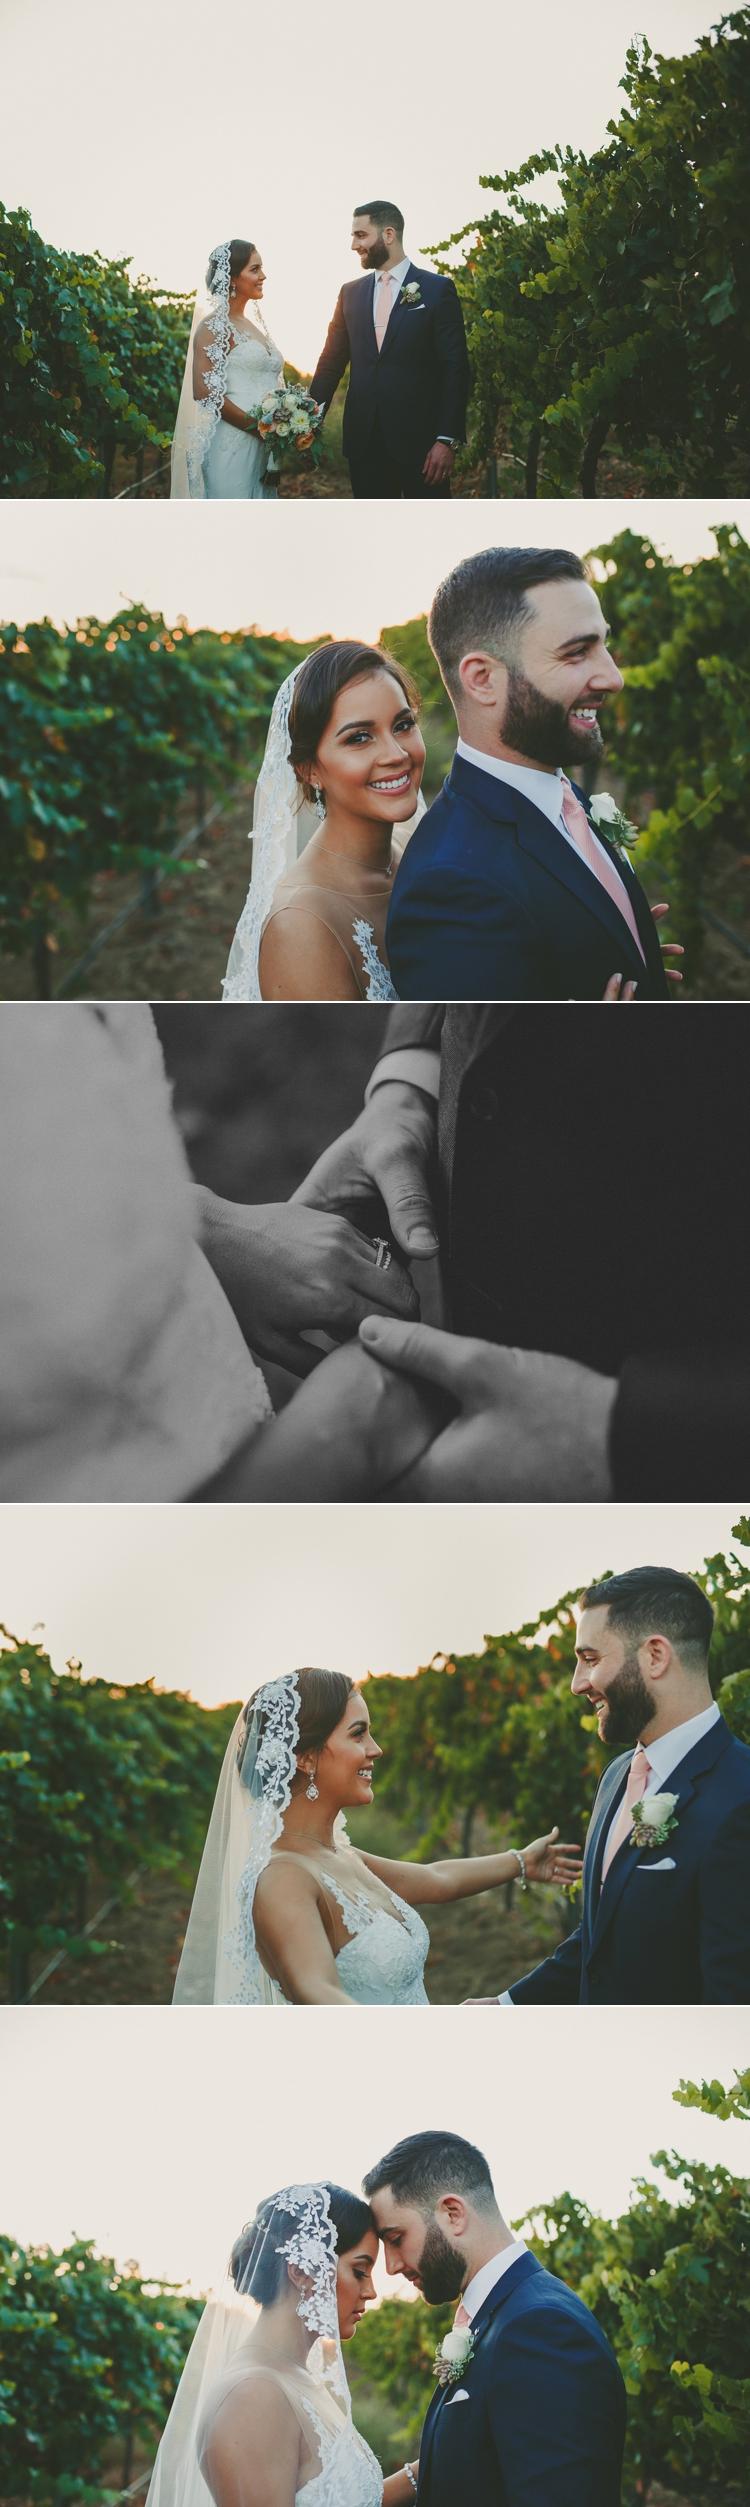 europa-village-winery-wedding-12